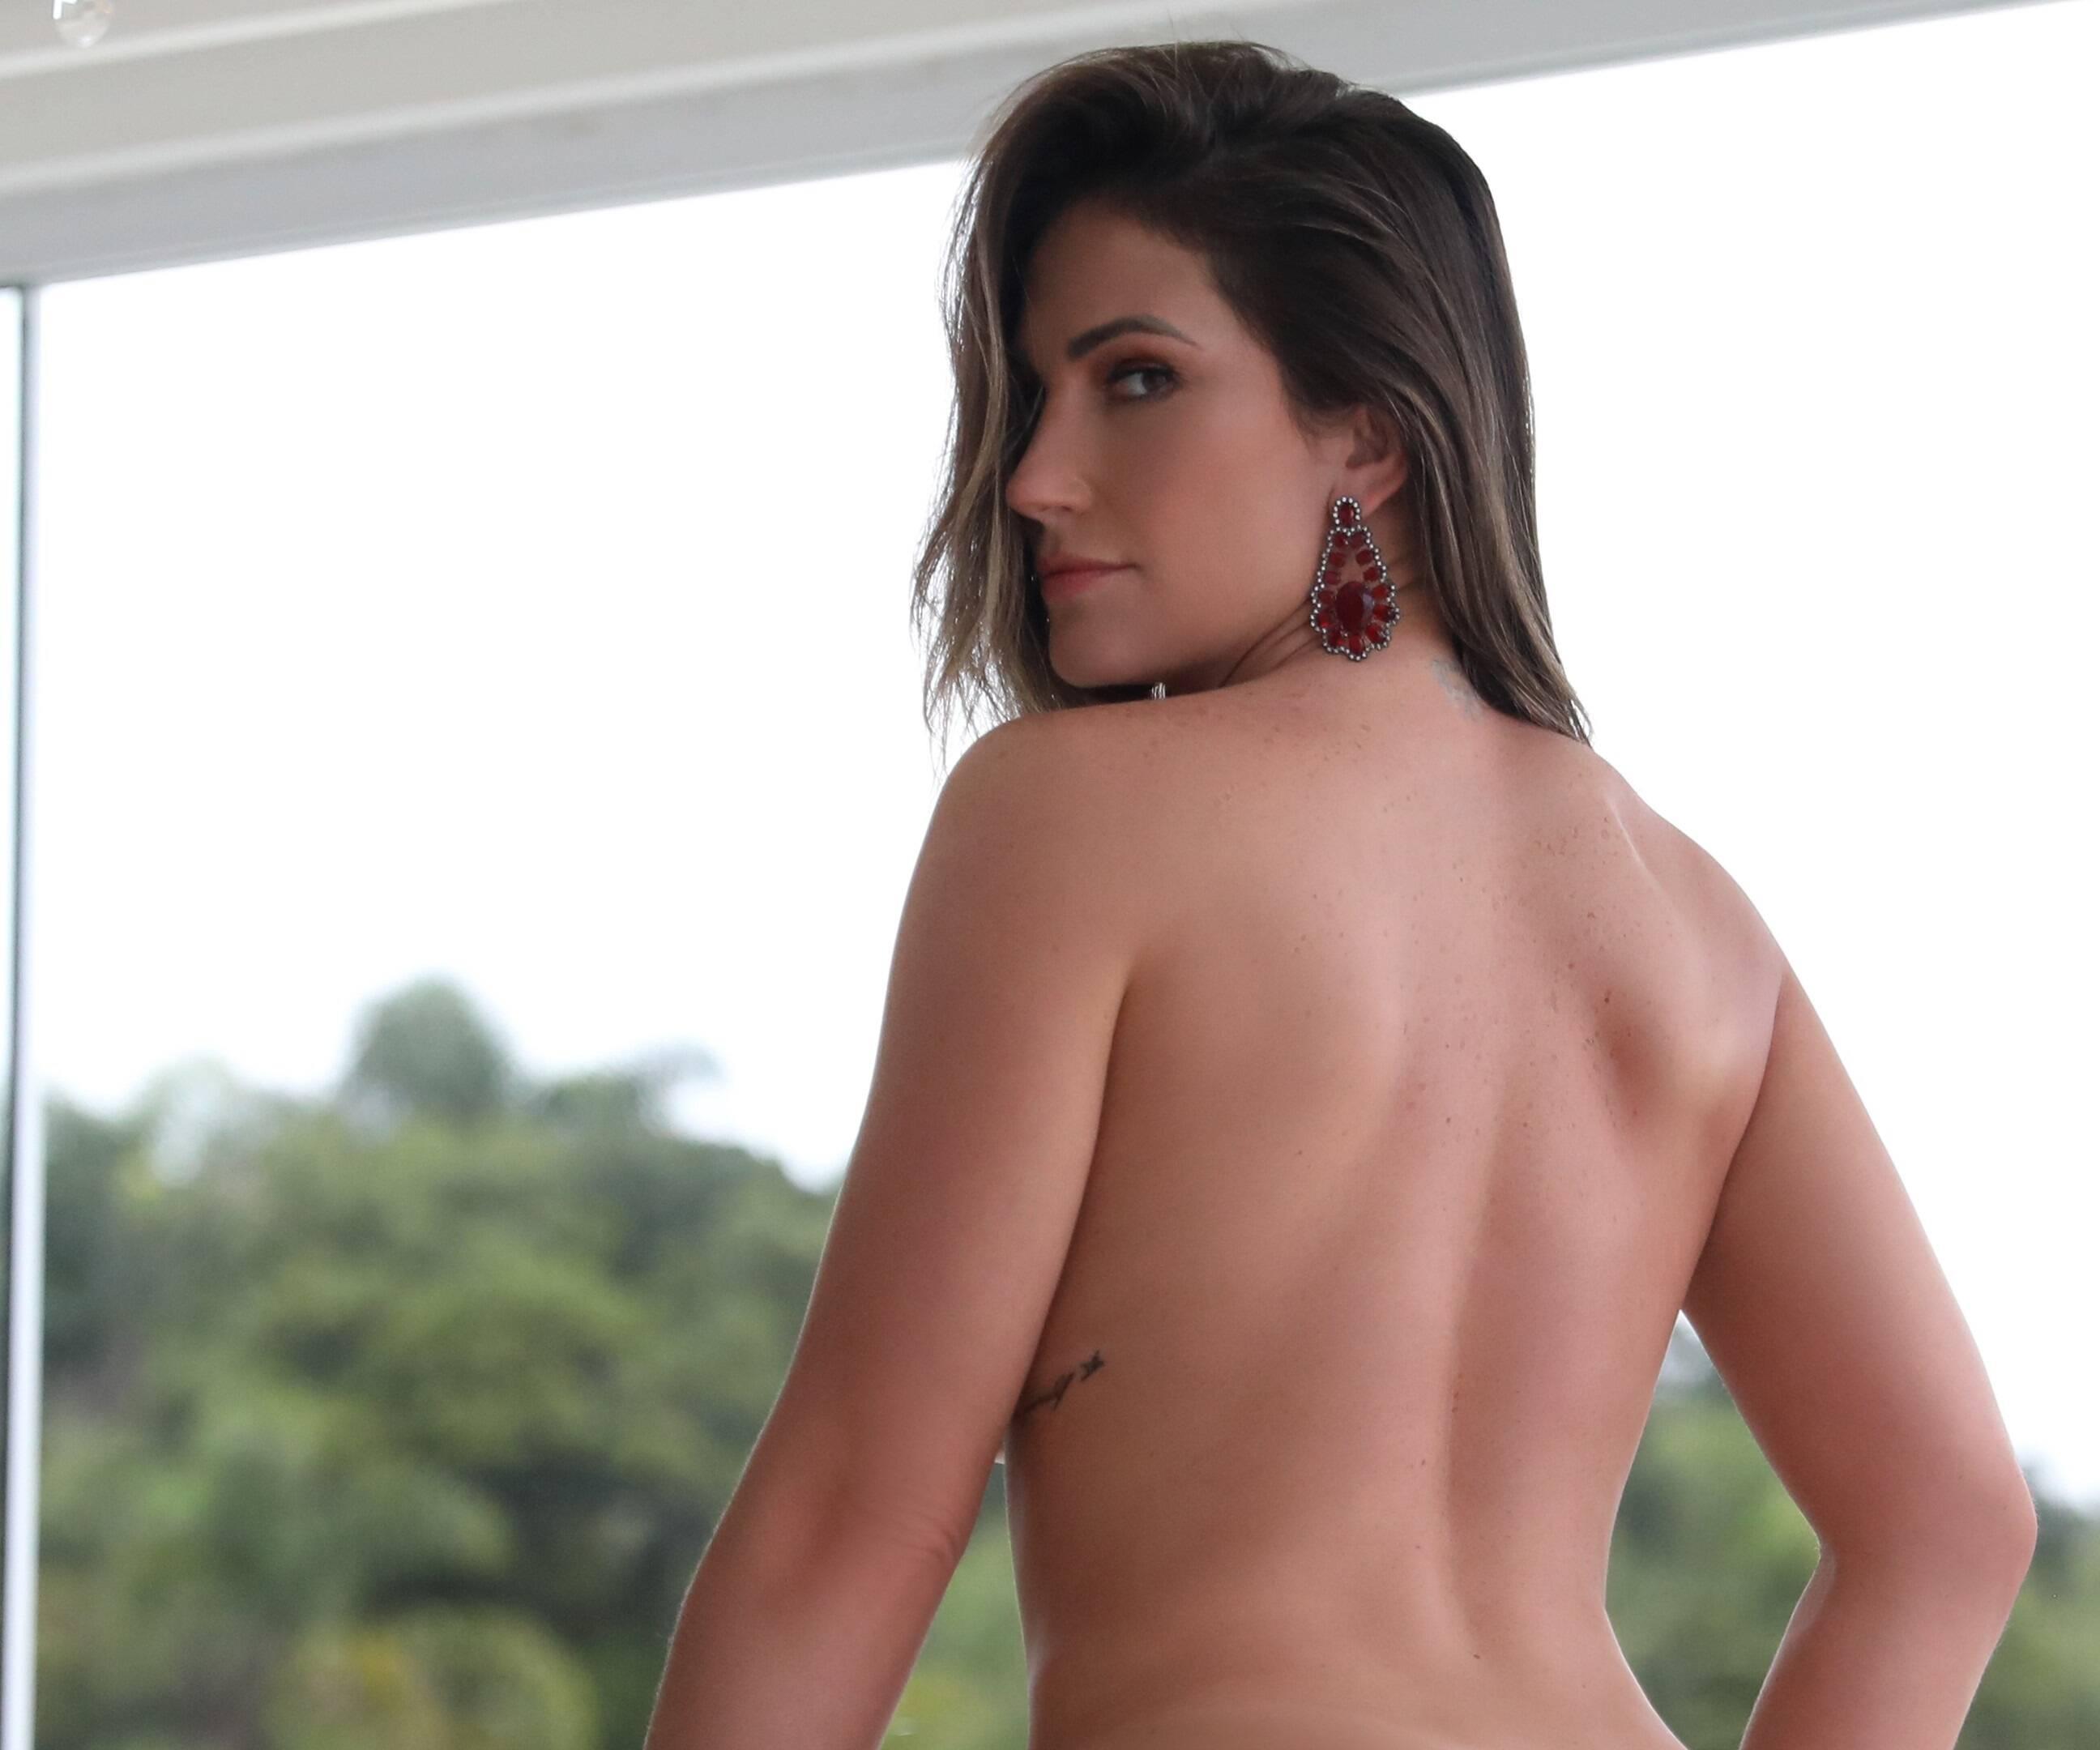 Ana Lucia Fernandes em ensaio para o site Diamond Brazil. Foto: Davi Borges/Diamond Brazil